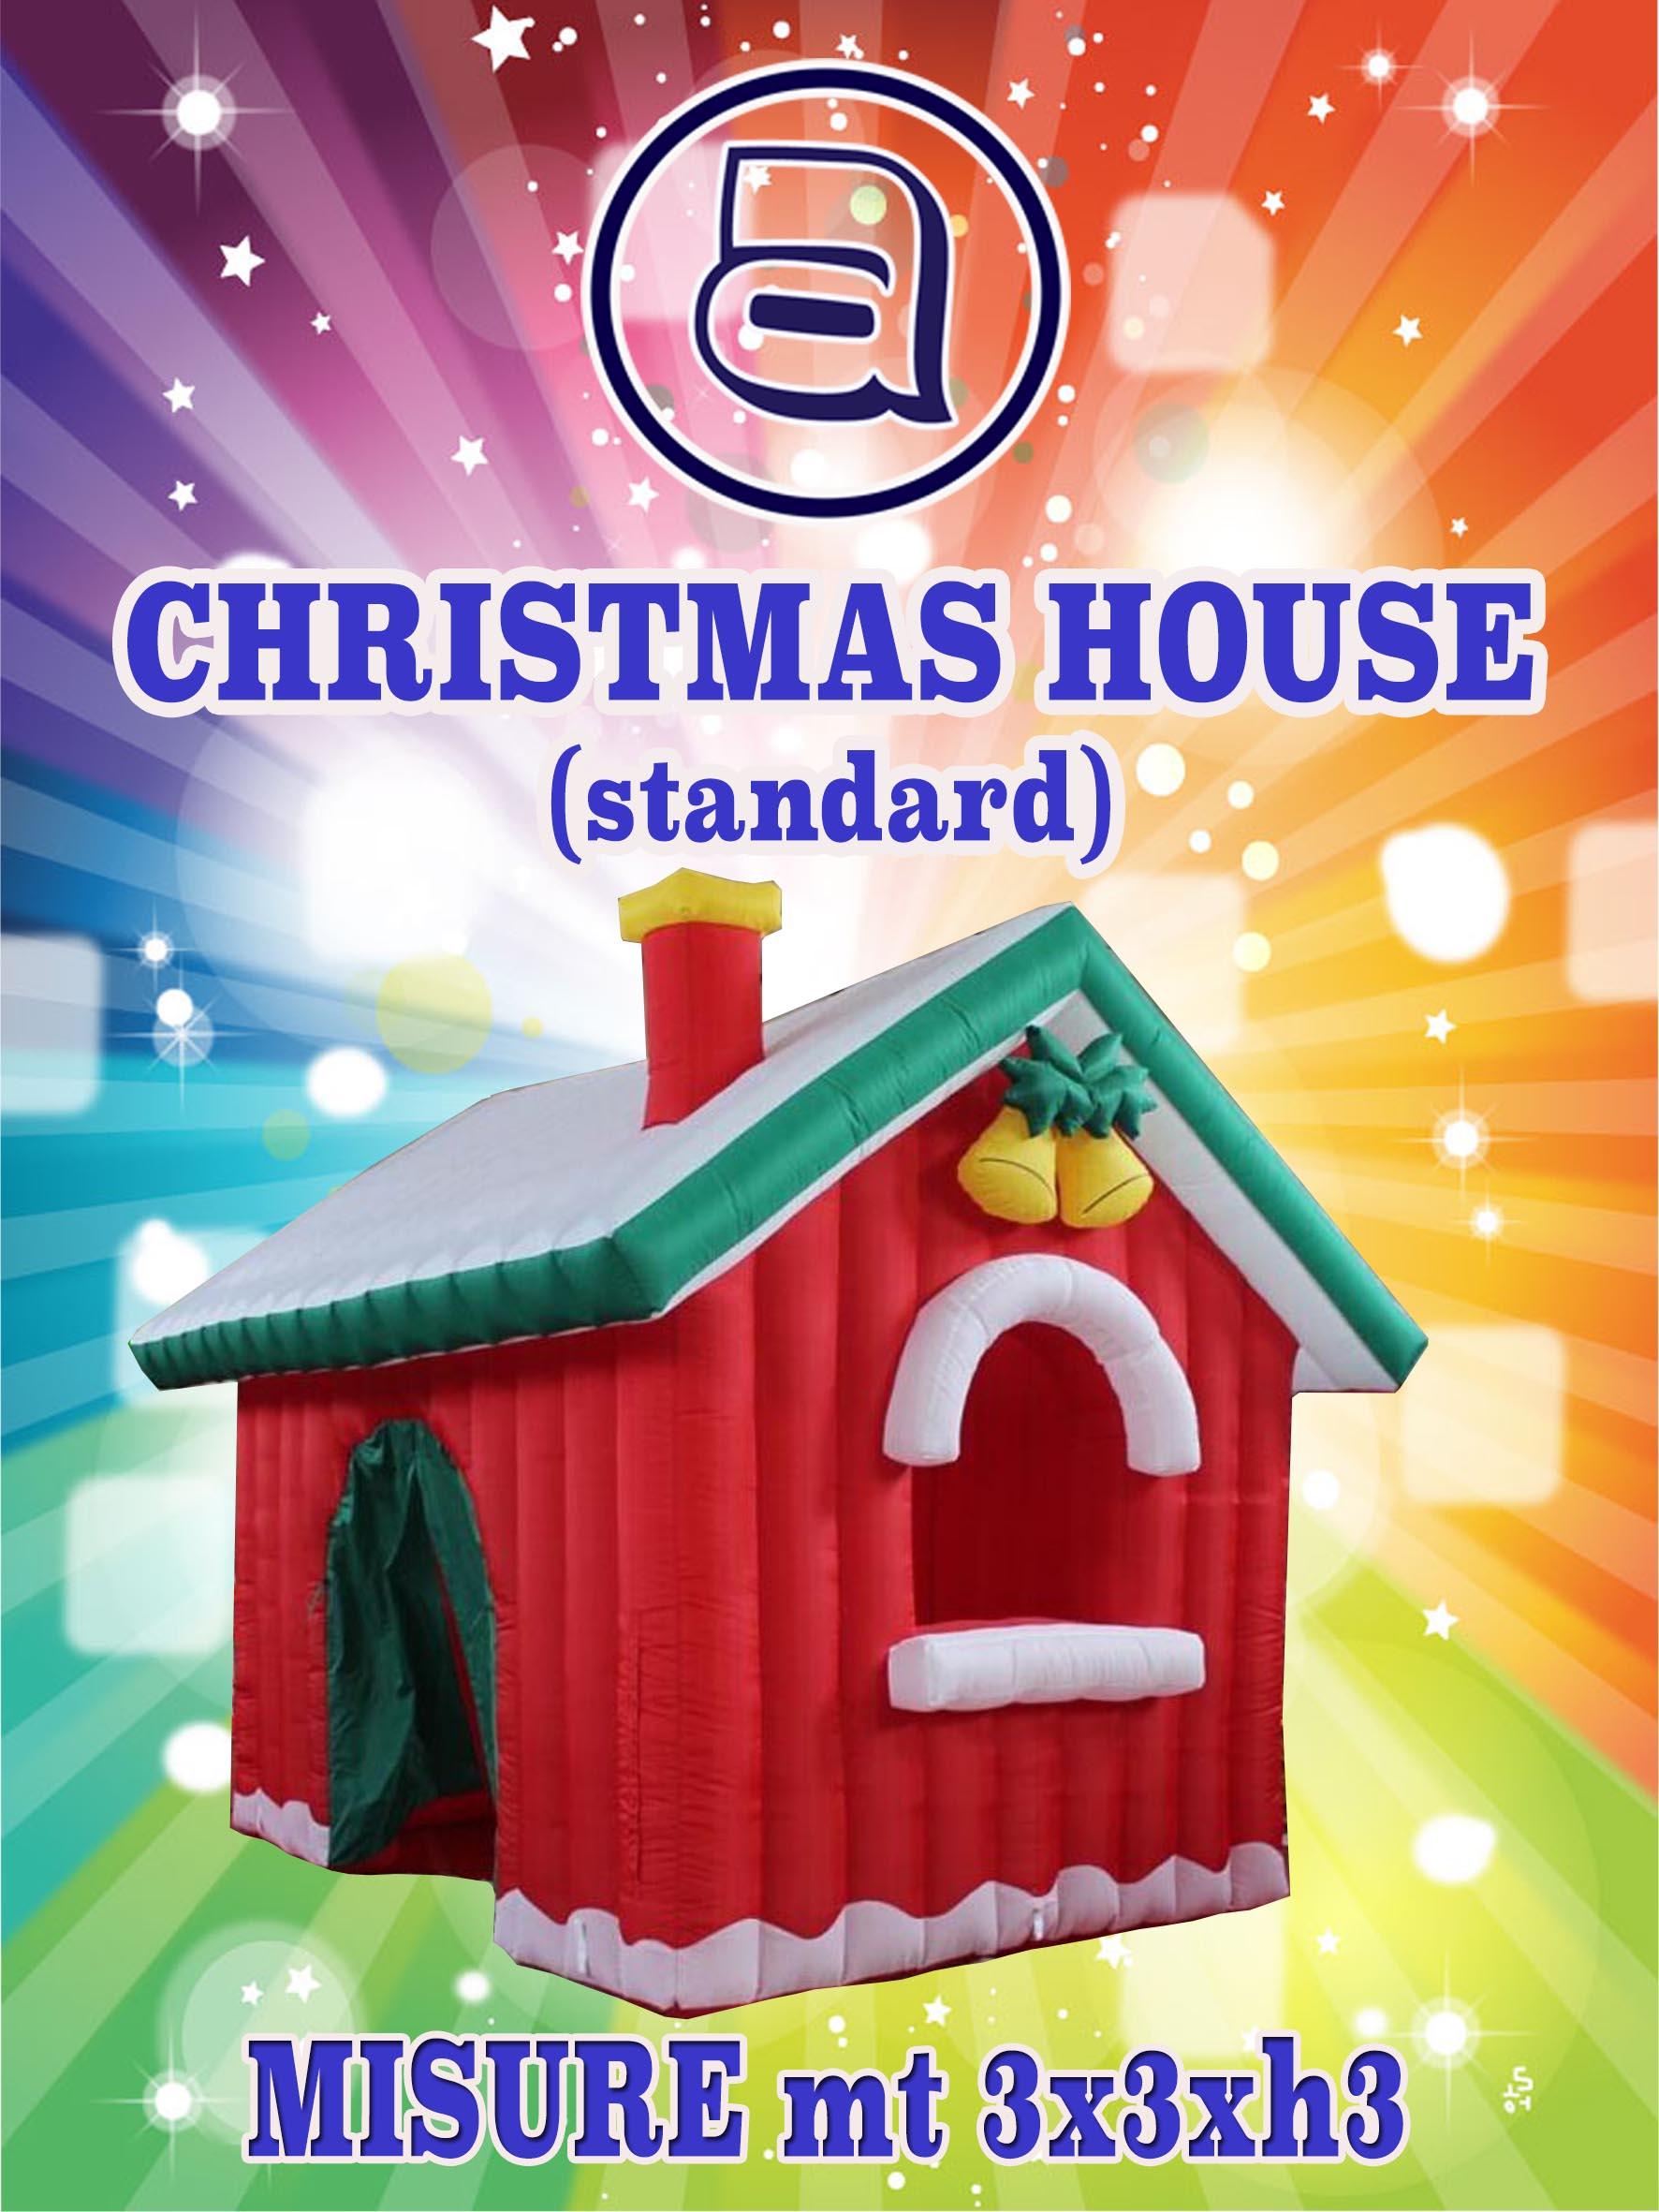 house-standard